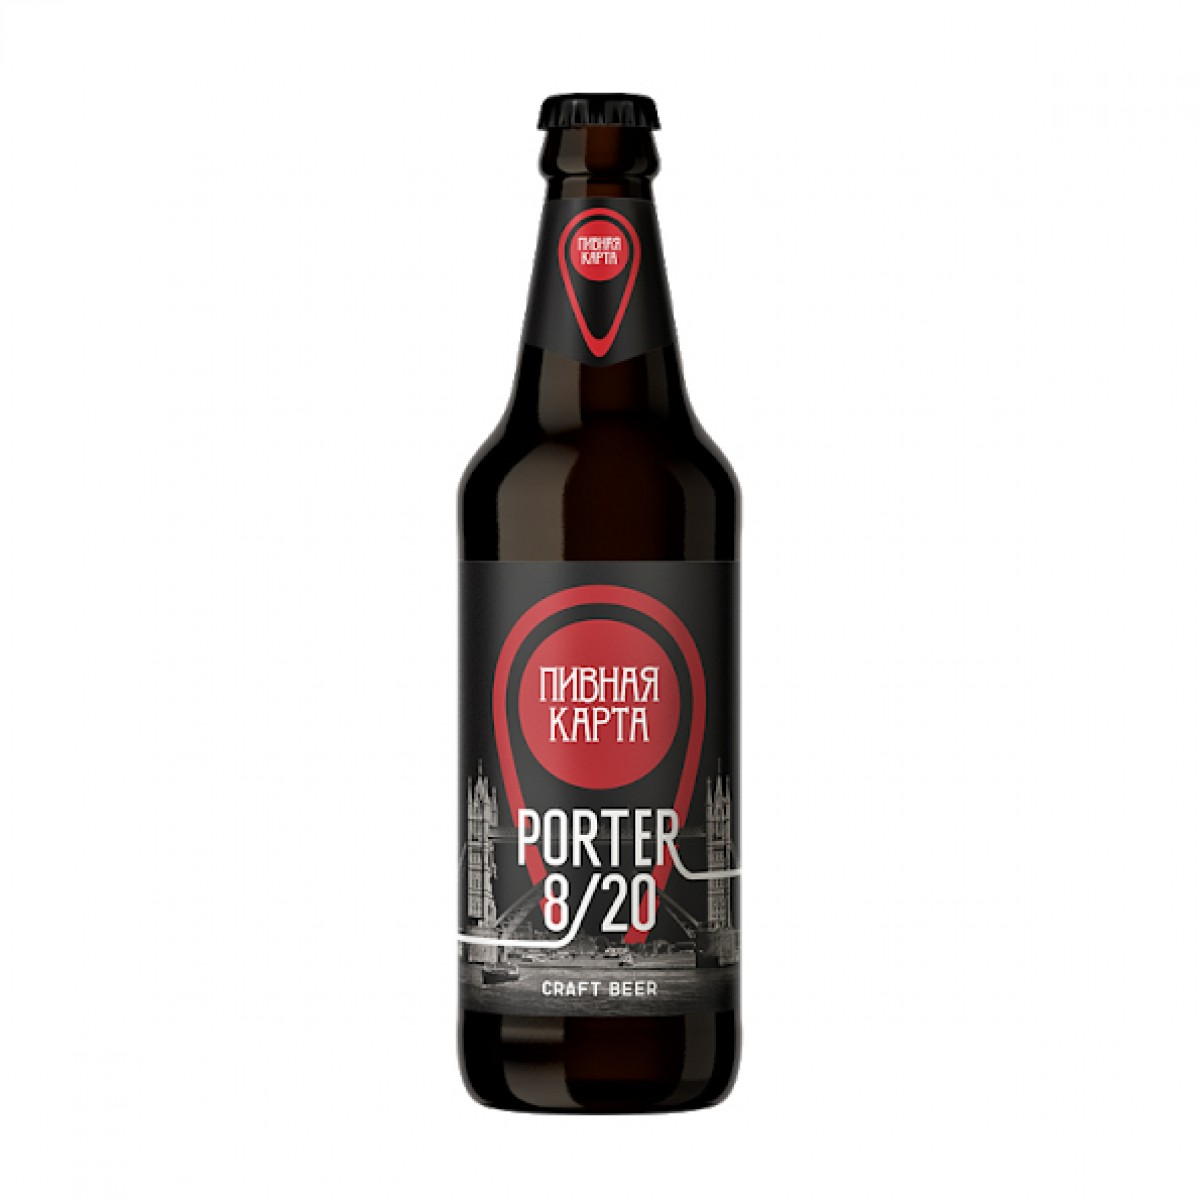 Bia Porter 8/20 8.5% – Chai 500ml